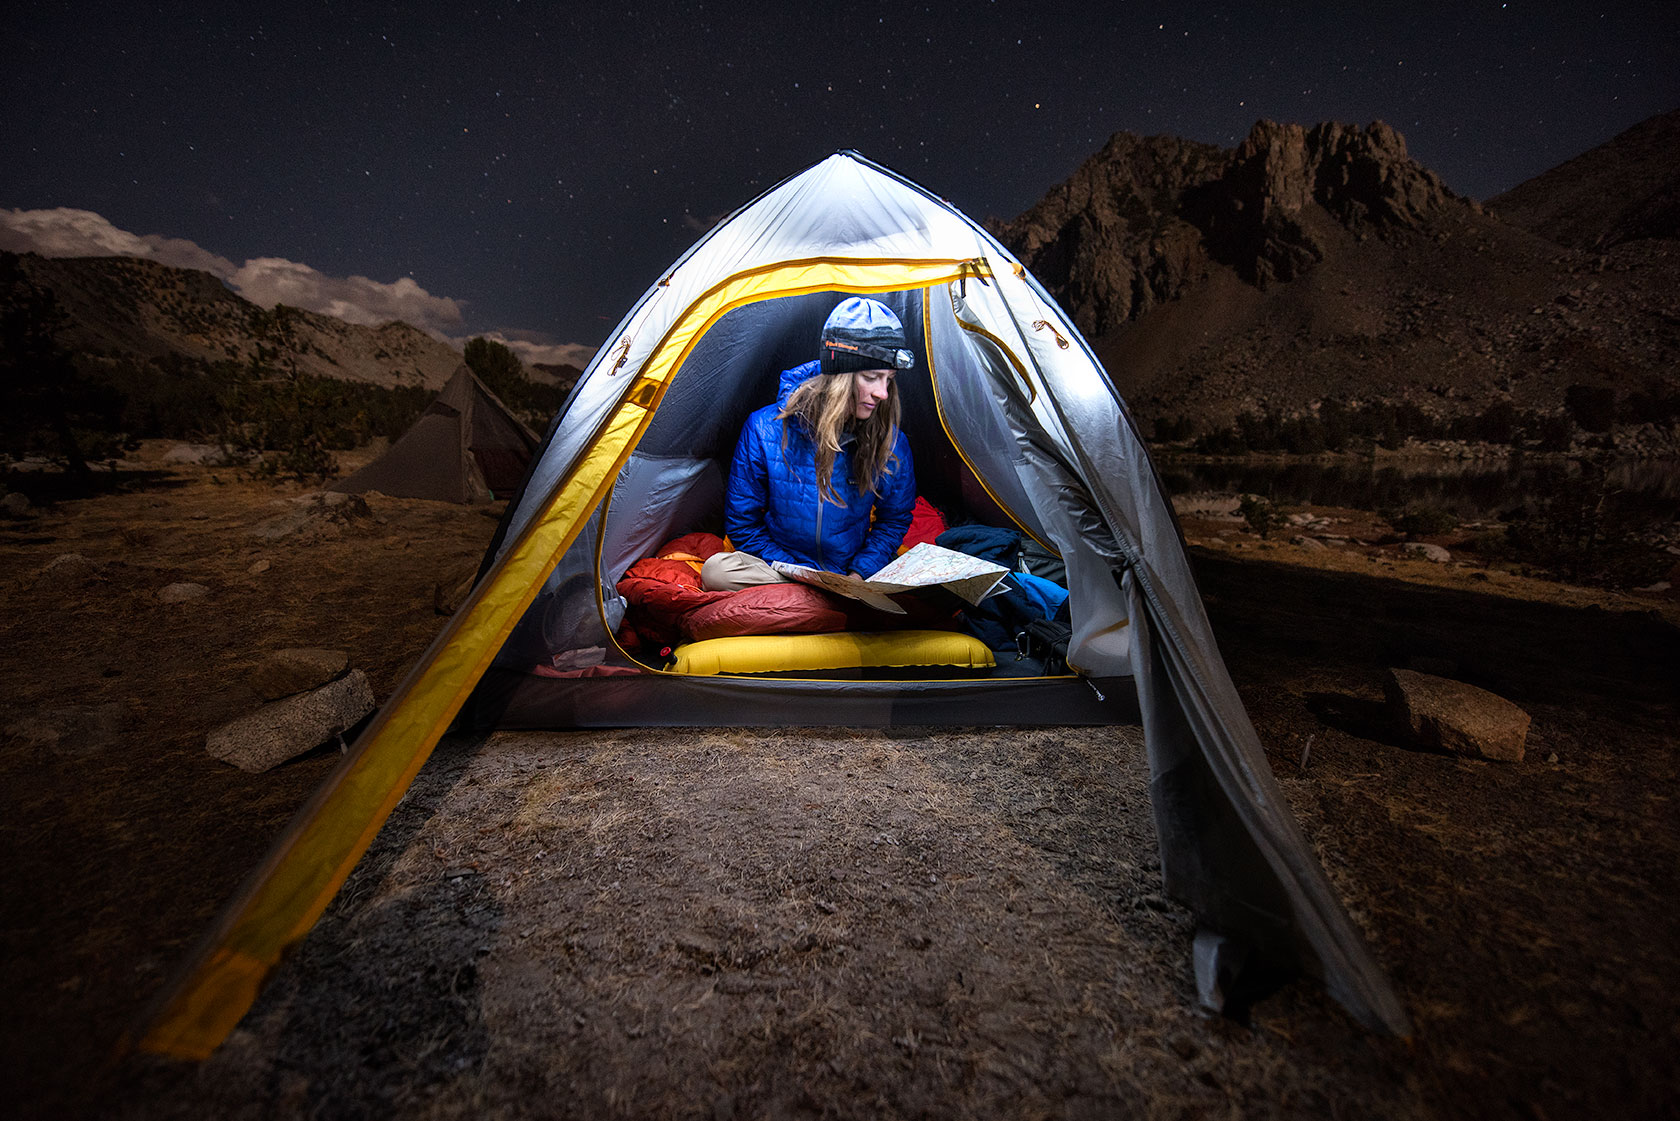 austin-trigg-big-agnes-tent-john-muir-trail-camping-night-light-MTNGLO-Lake-Virgina.jpg